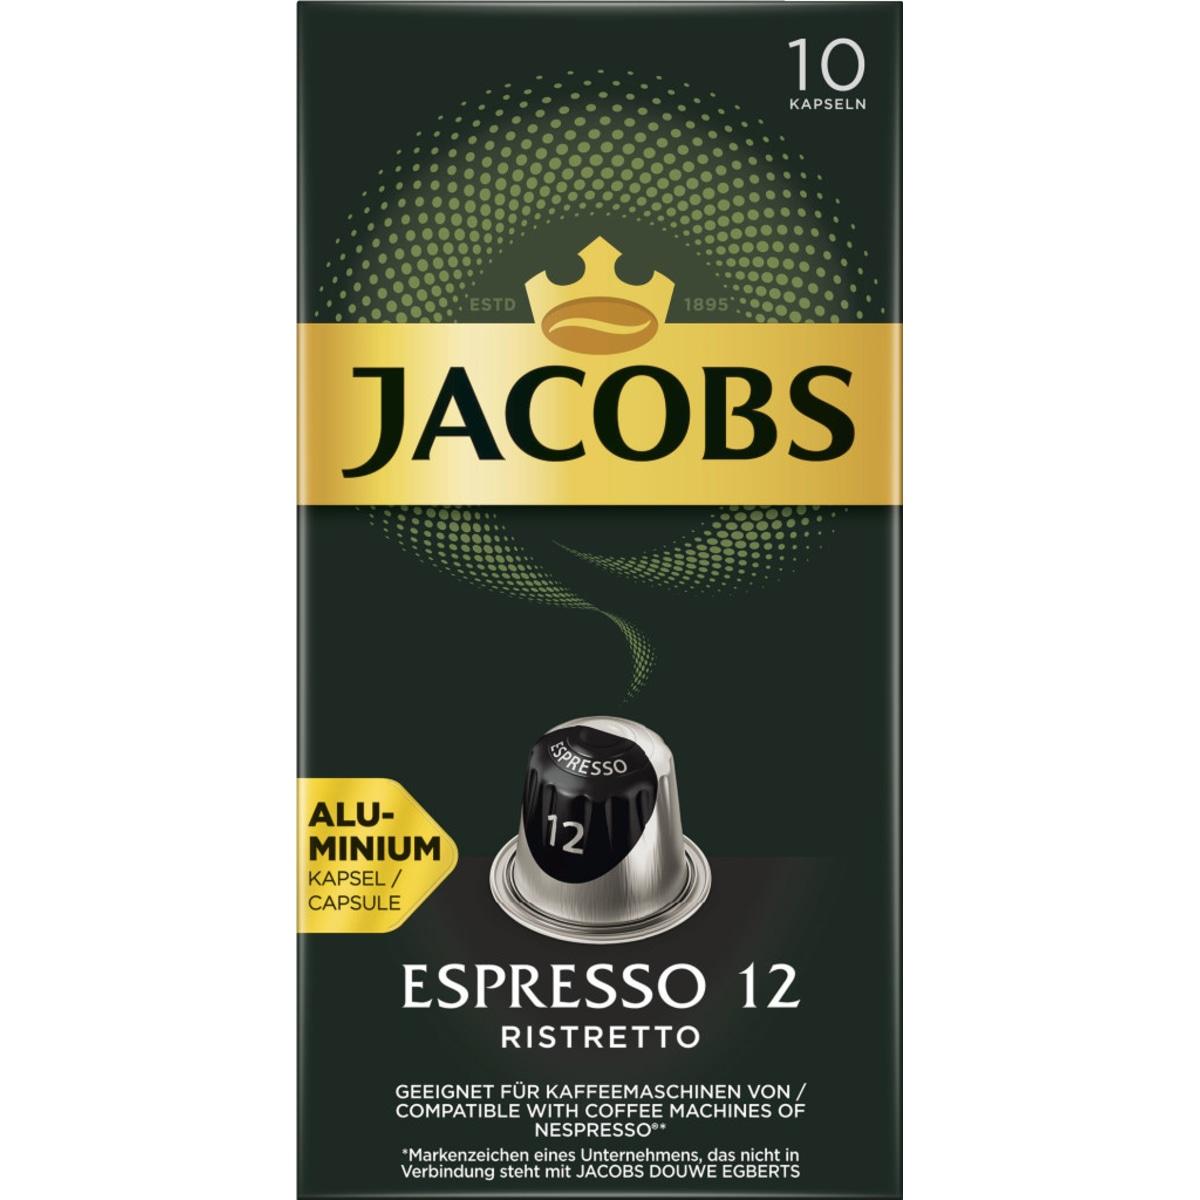 Jacobs NC Kapseln Espresso Ristretto